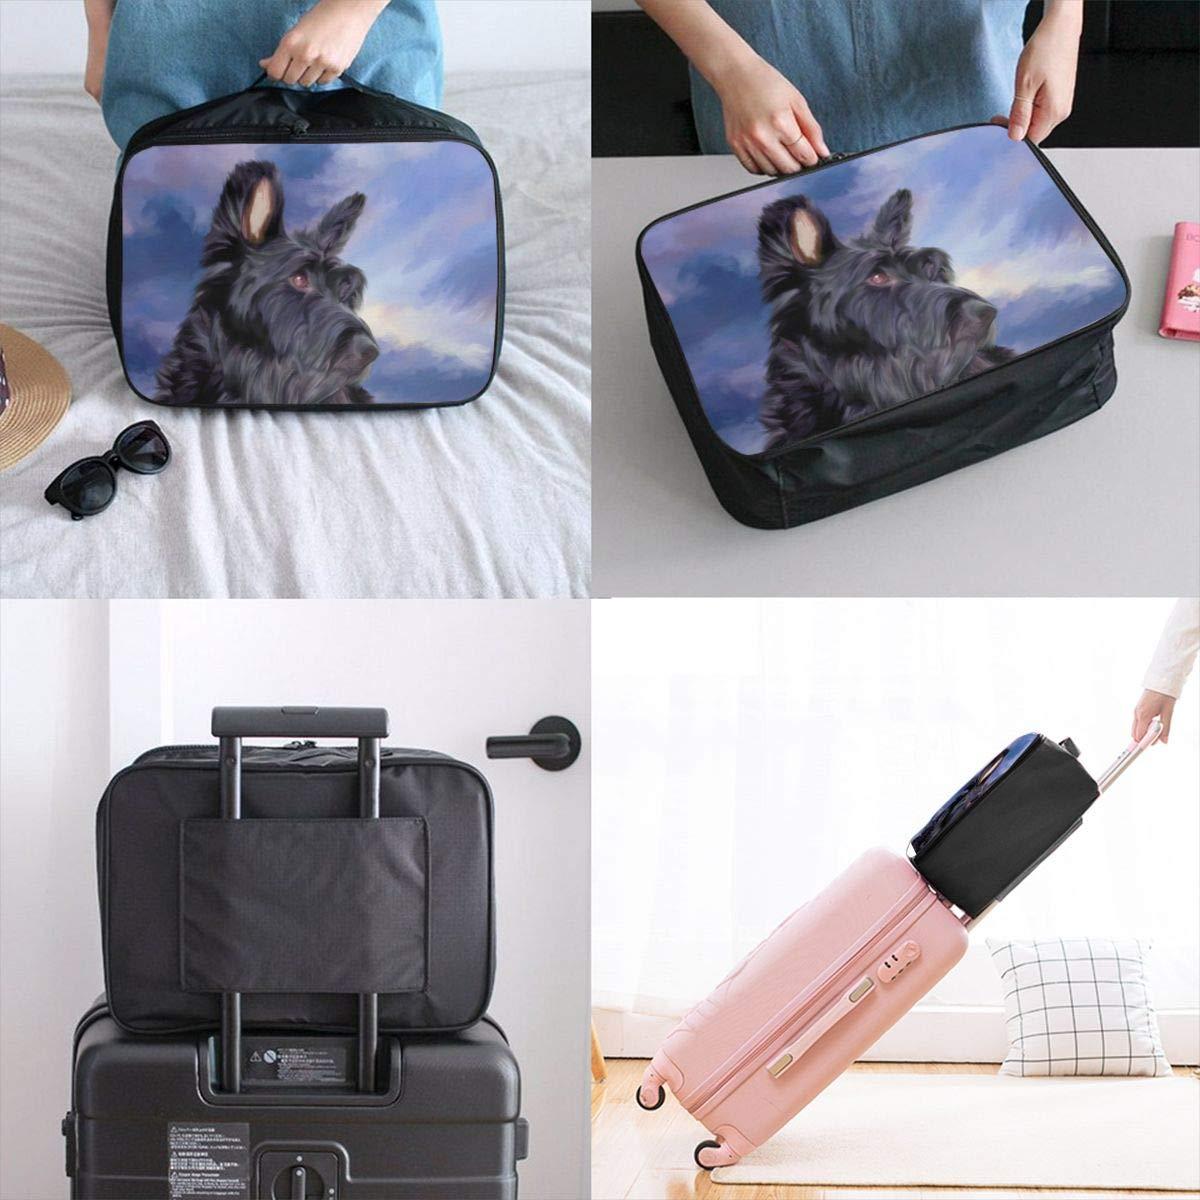 Dog Animal Lovely Scottish Terrier Travel Lightweight Waterproof Foldable Storage Carry Luggage Large Capacity Portable Luggage Bag Duffel Bag